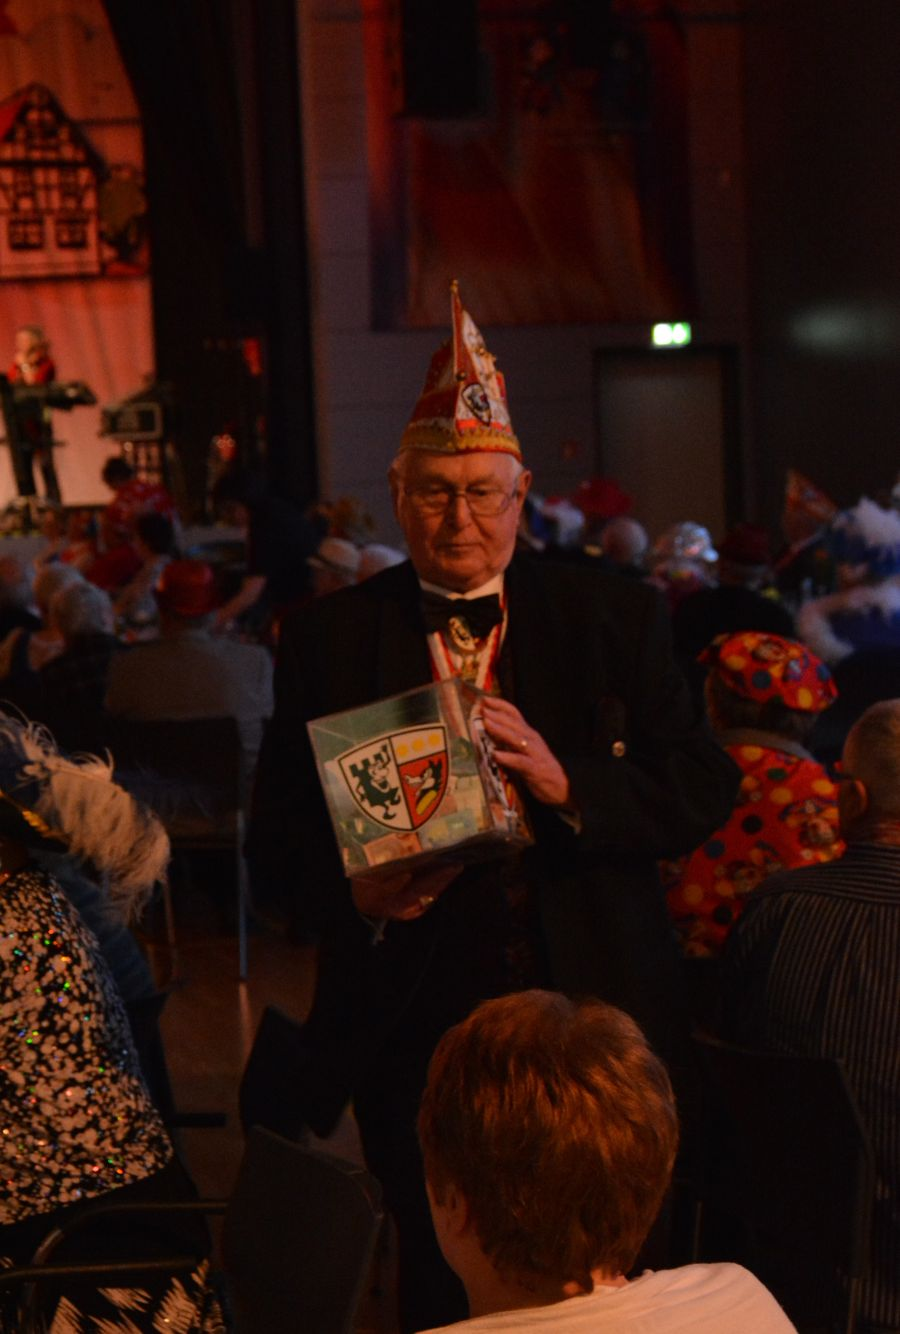 2016.01.10 KG - Seniorenfest 035